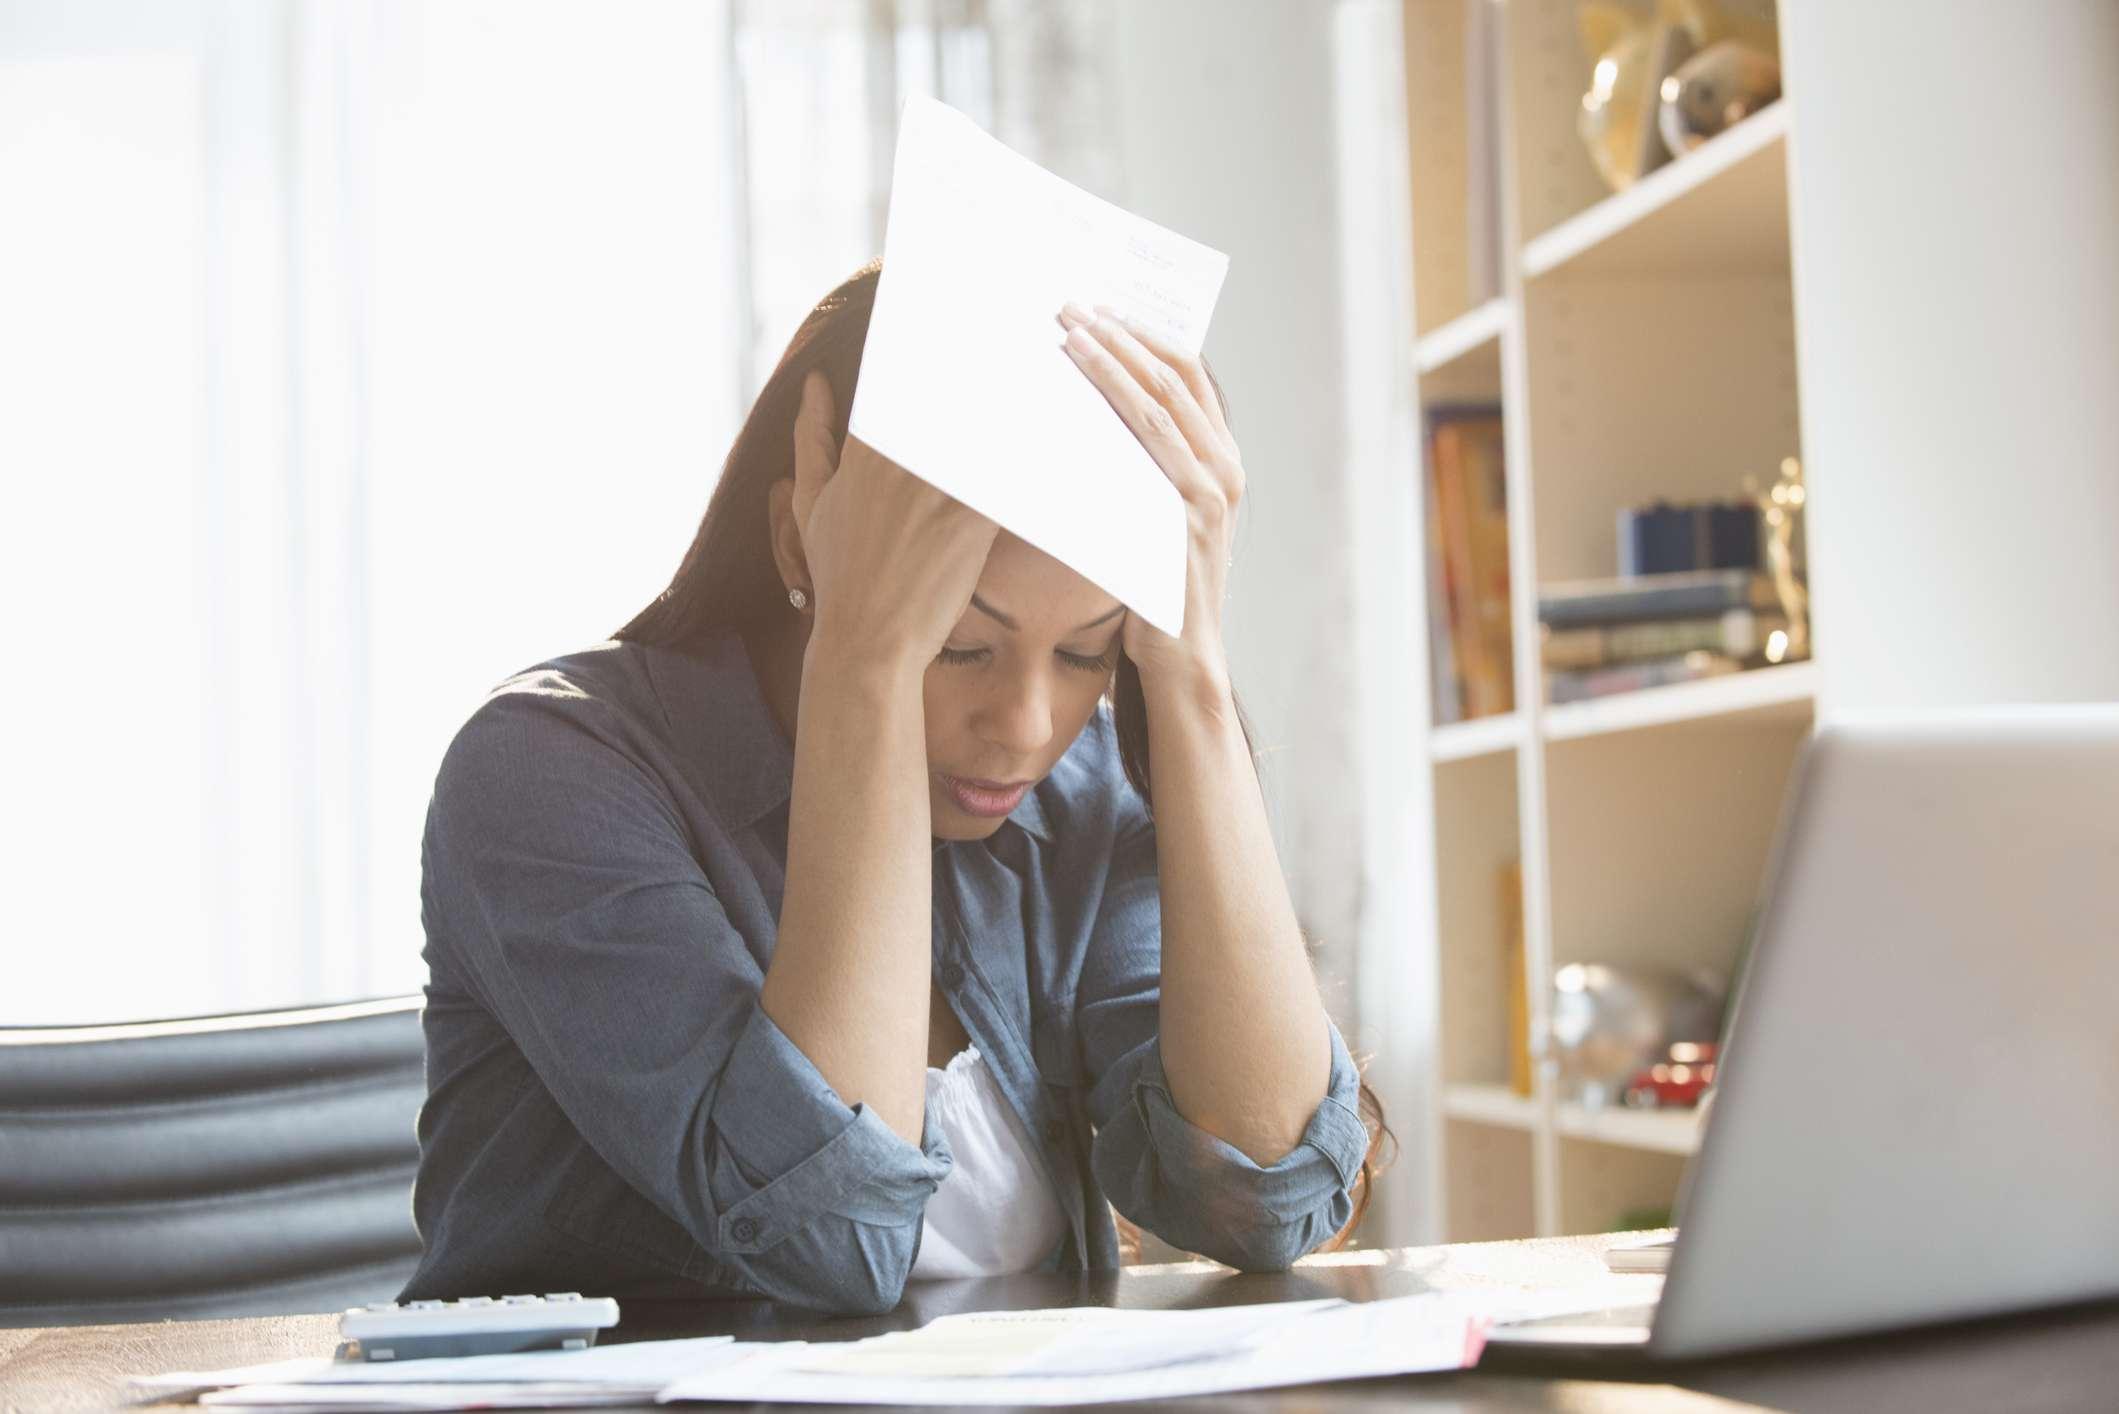 Anxious mixed race woman paying bills on laptop.